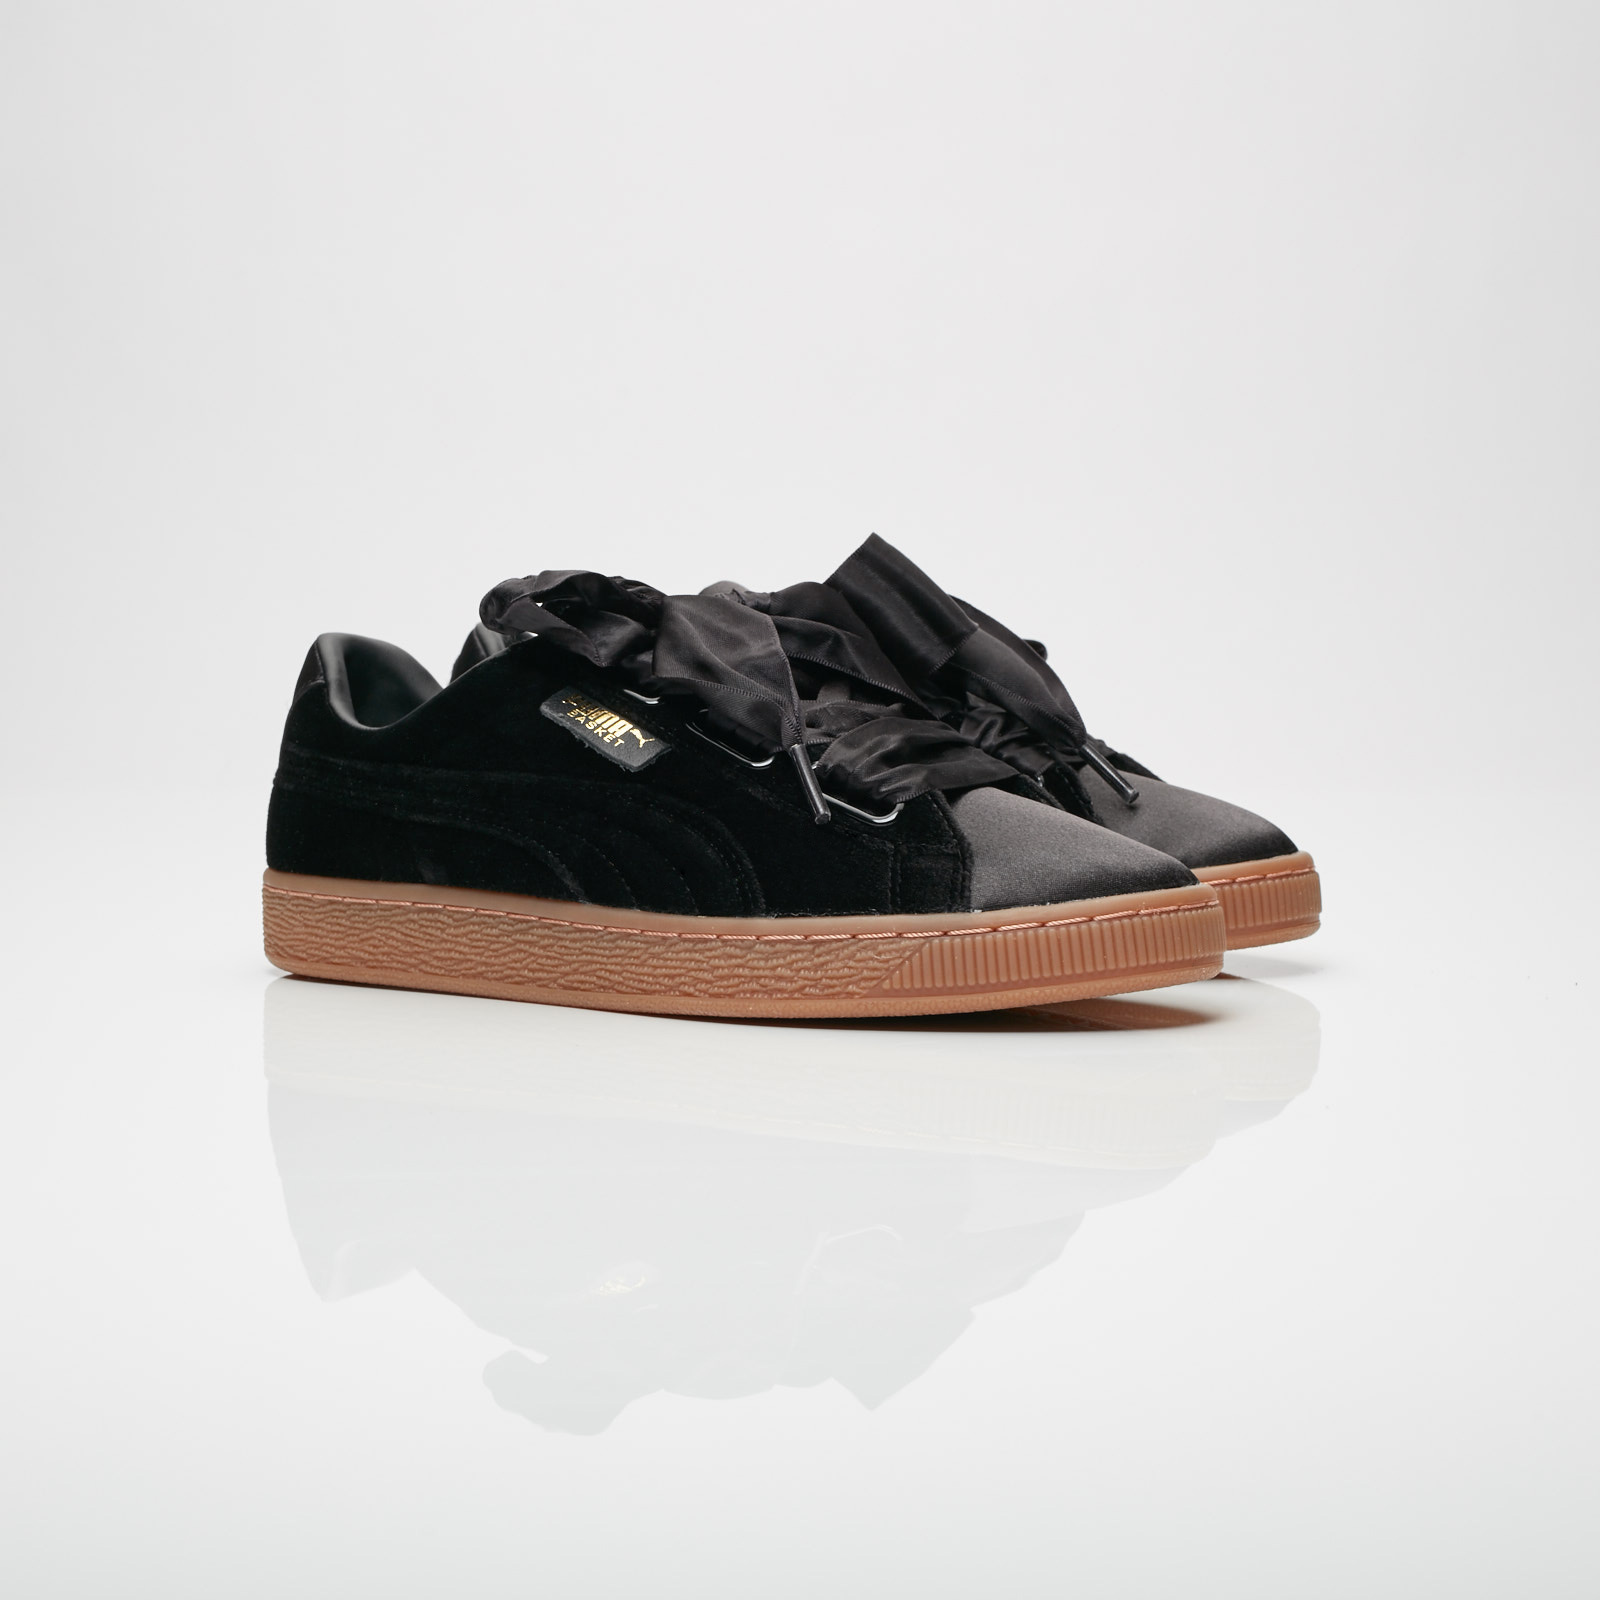 Puma Basket Heart VS Wmns - 366731-03 - SNS | sneakers ...